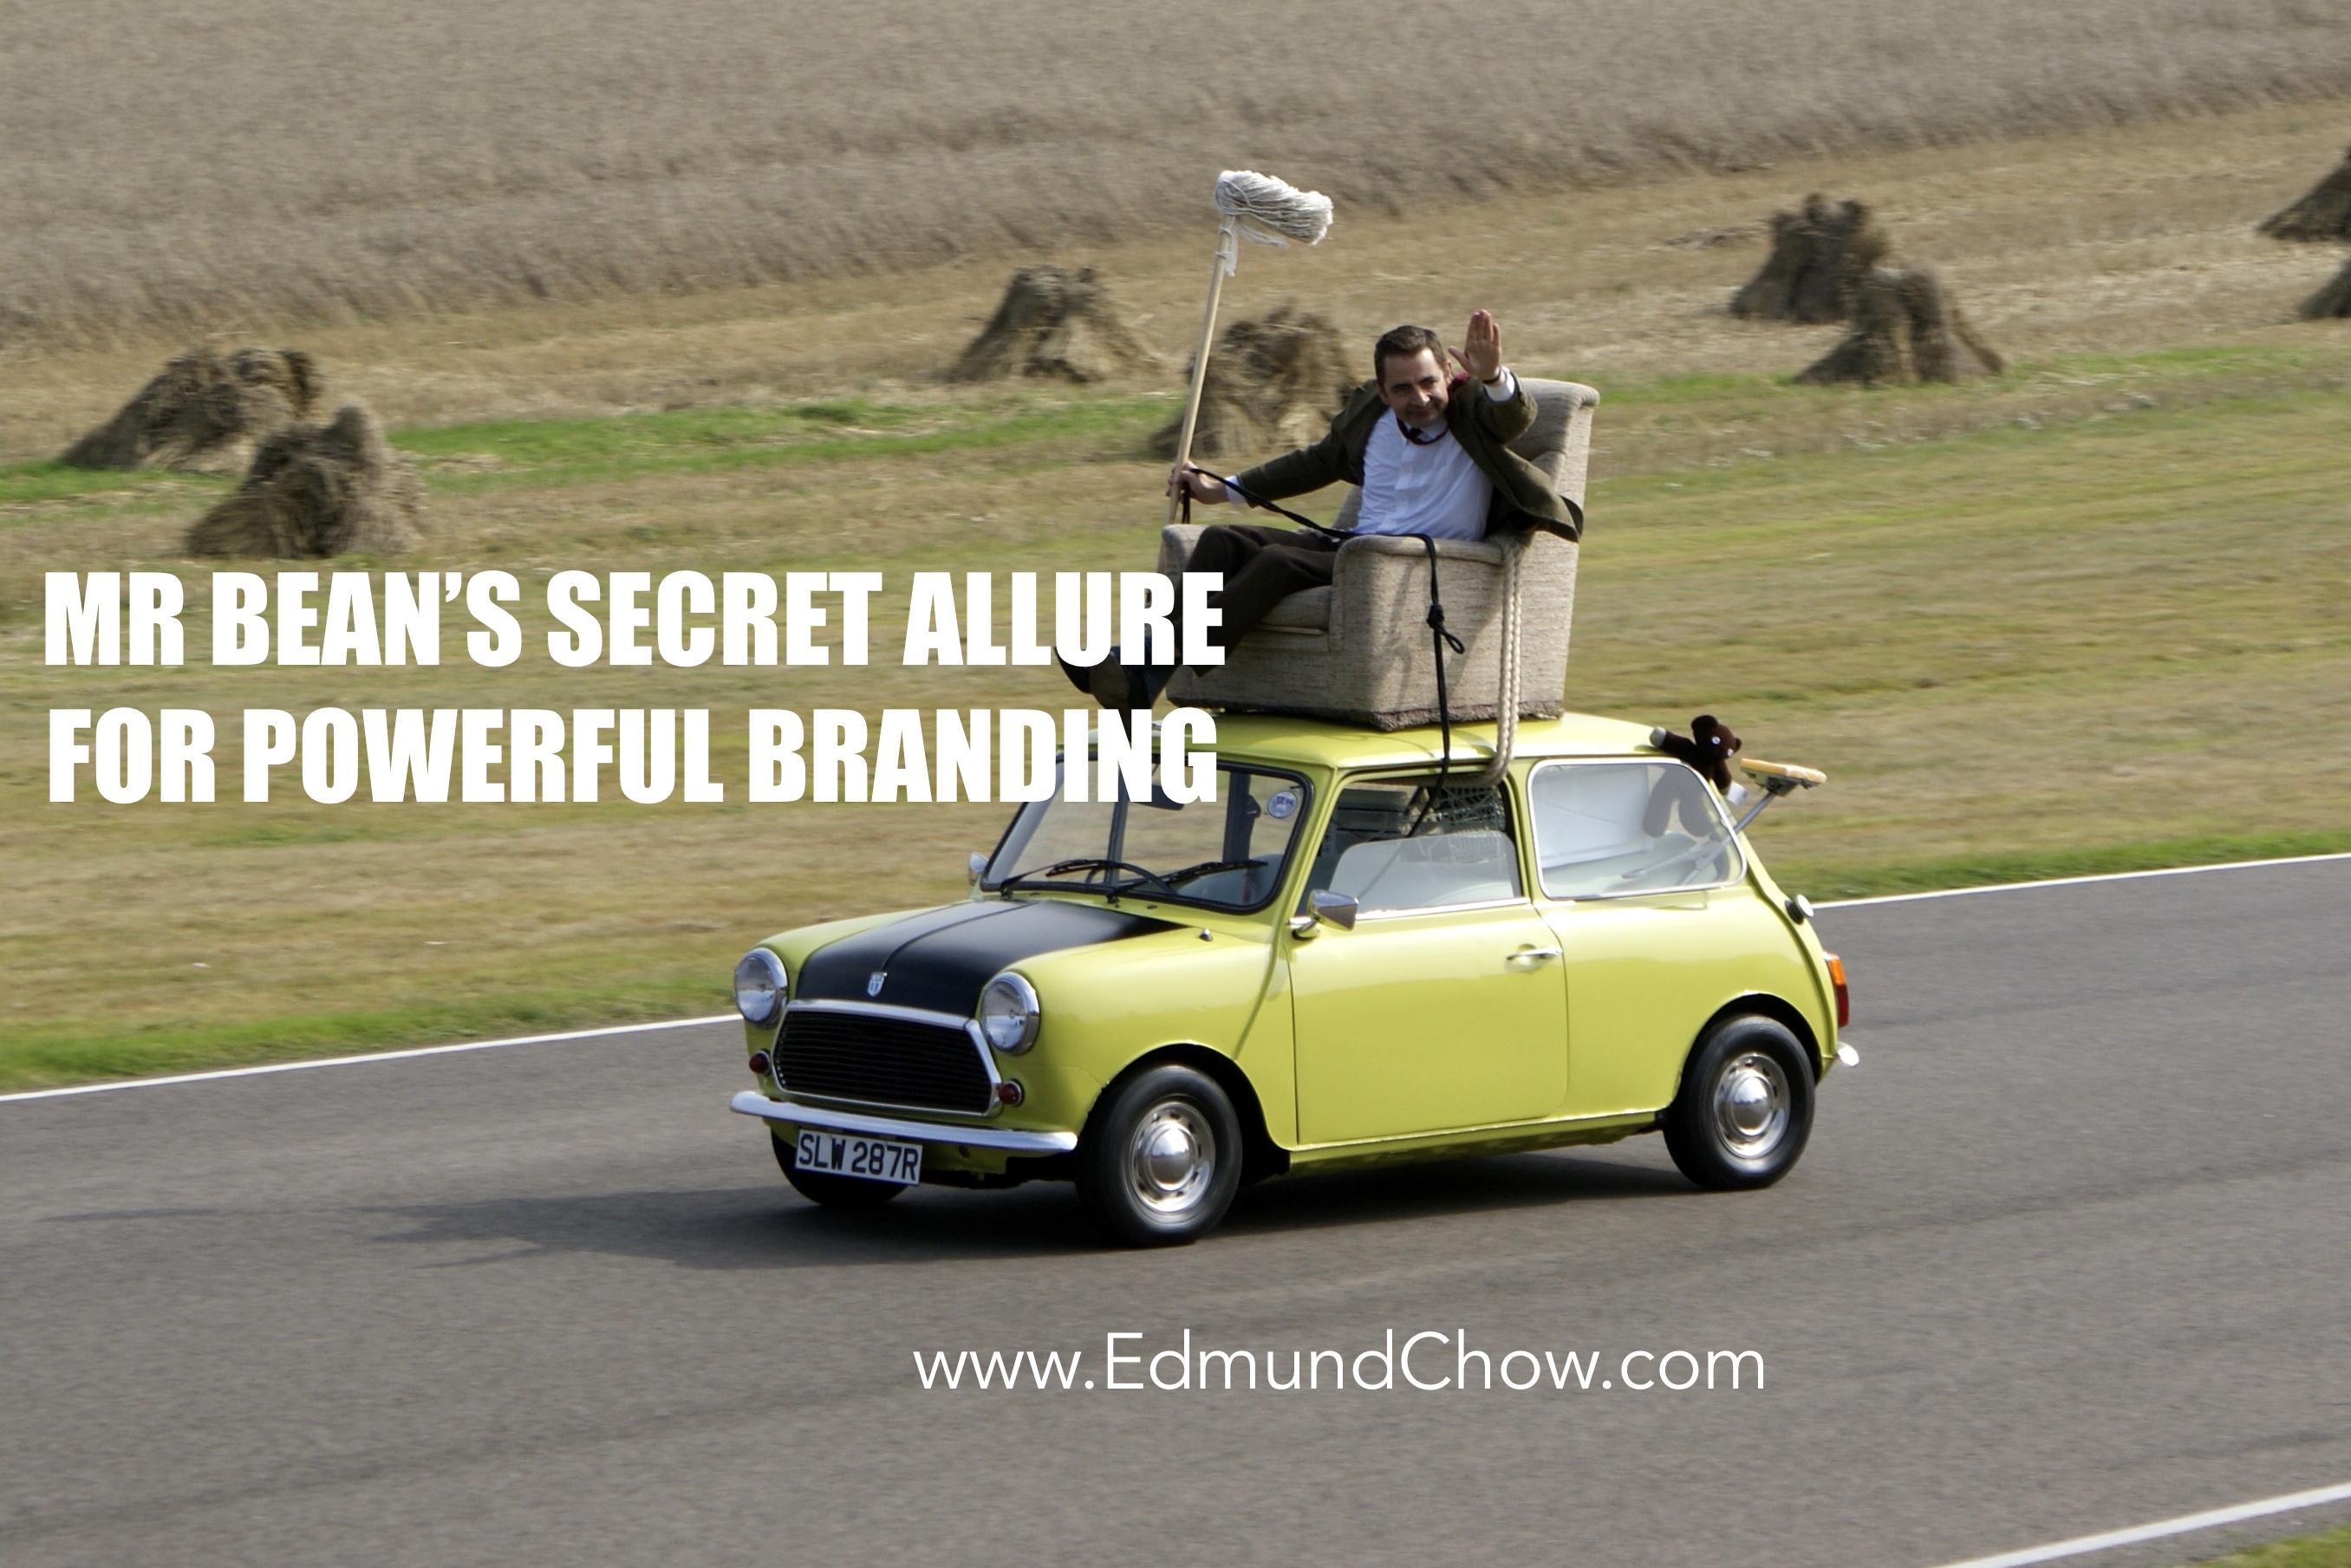 Storytelling and Story Selling: Mr Bean's Secret Allure for Powerful Branding